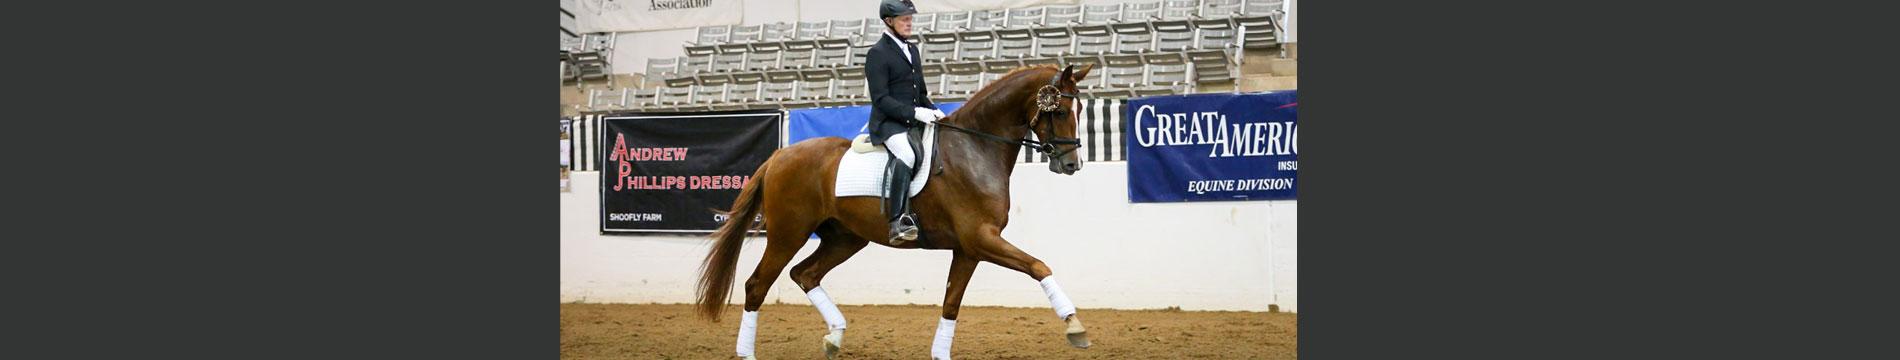 Dressage Horses For Sale North Texas Equestrian Center Inc